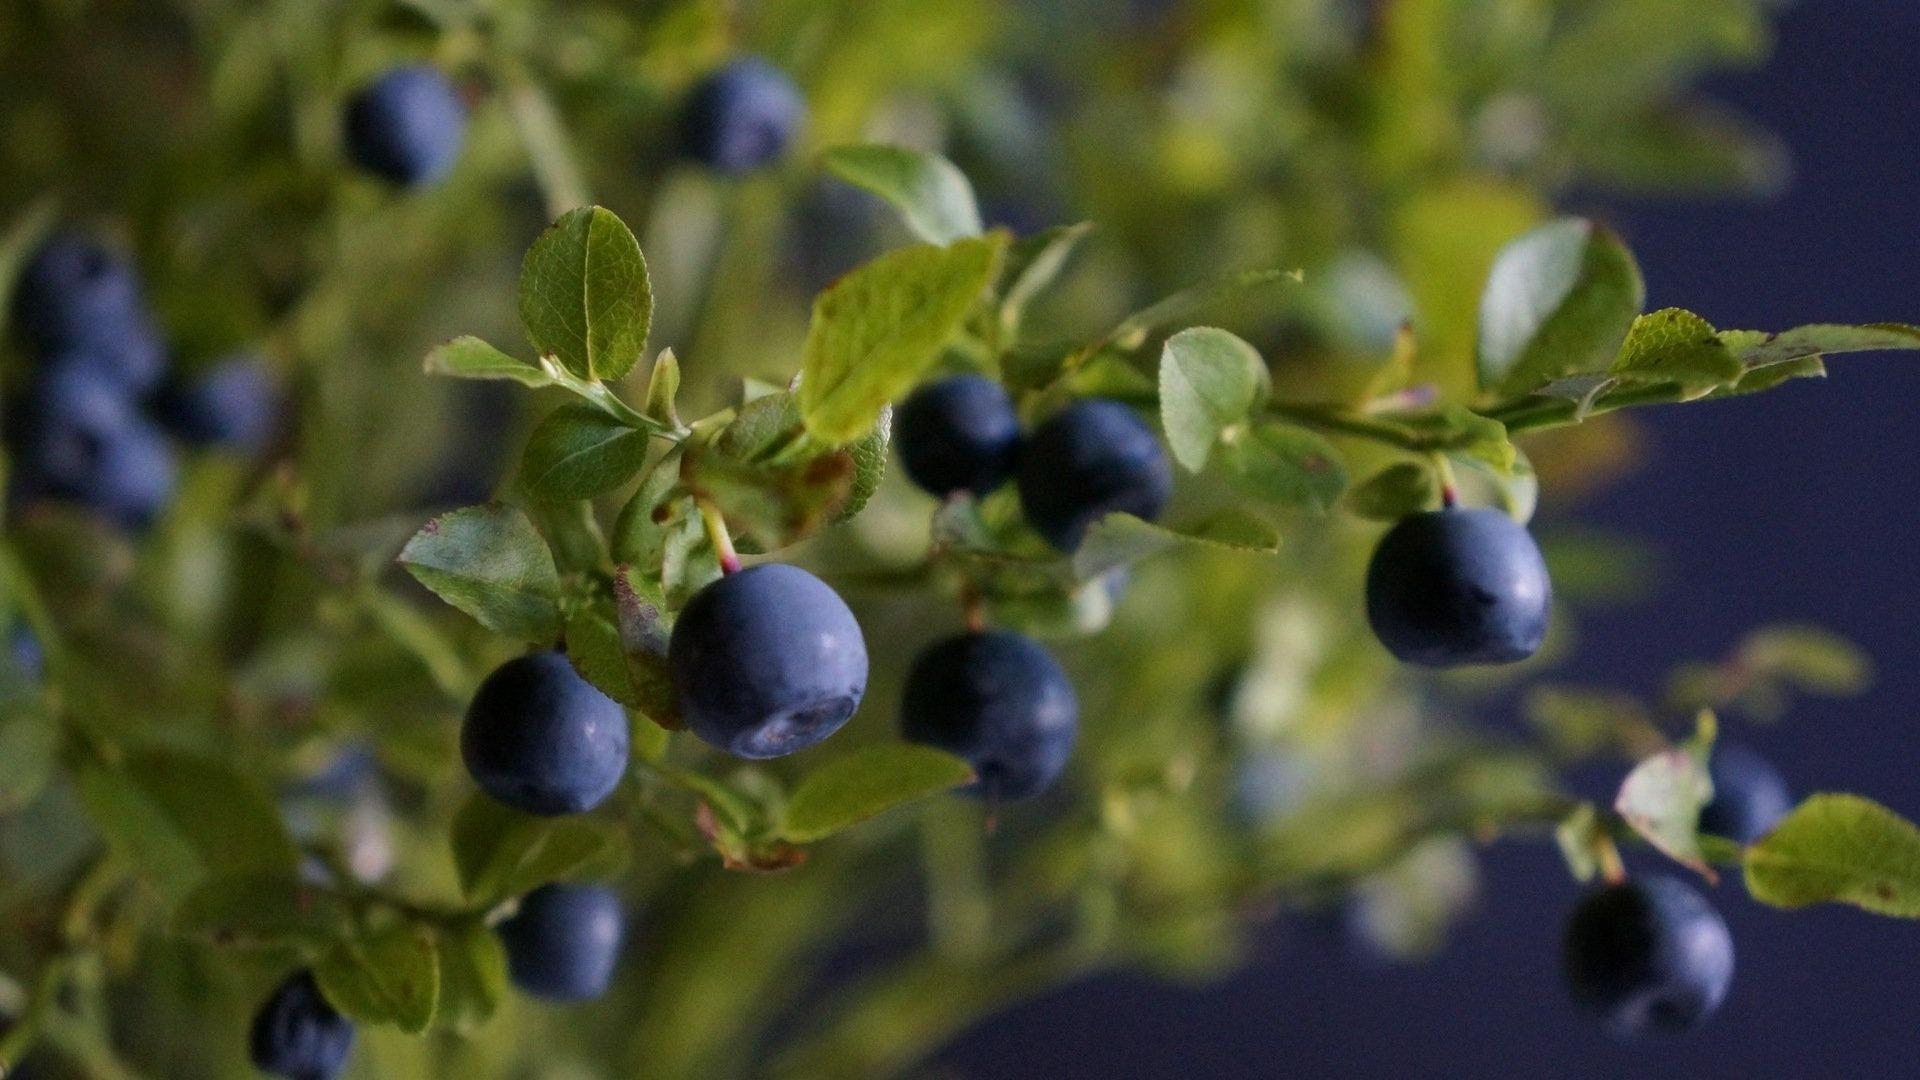 Berries On A Branch best wallpaper